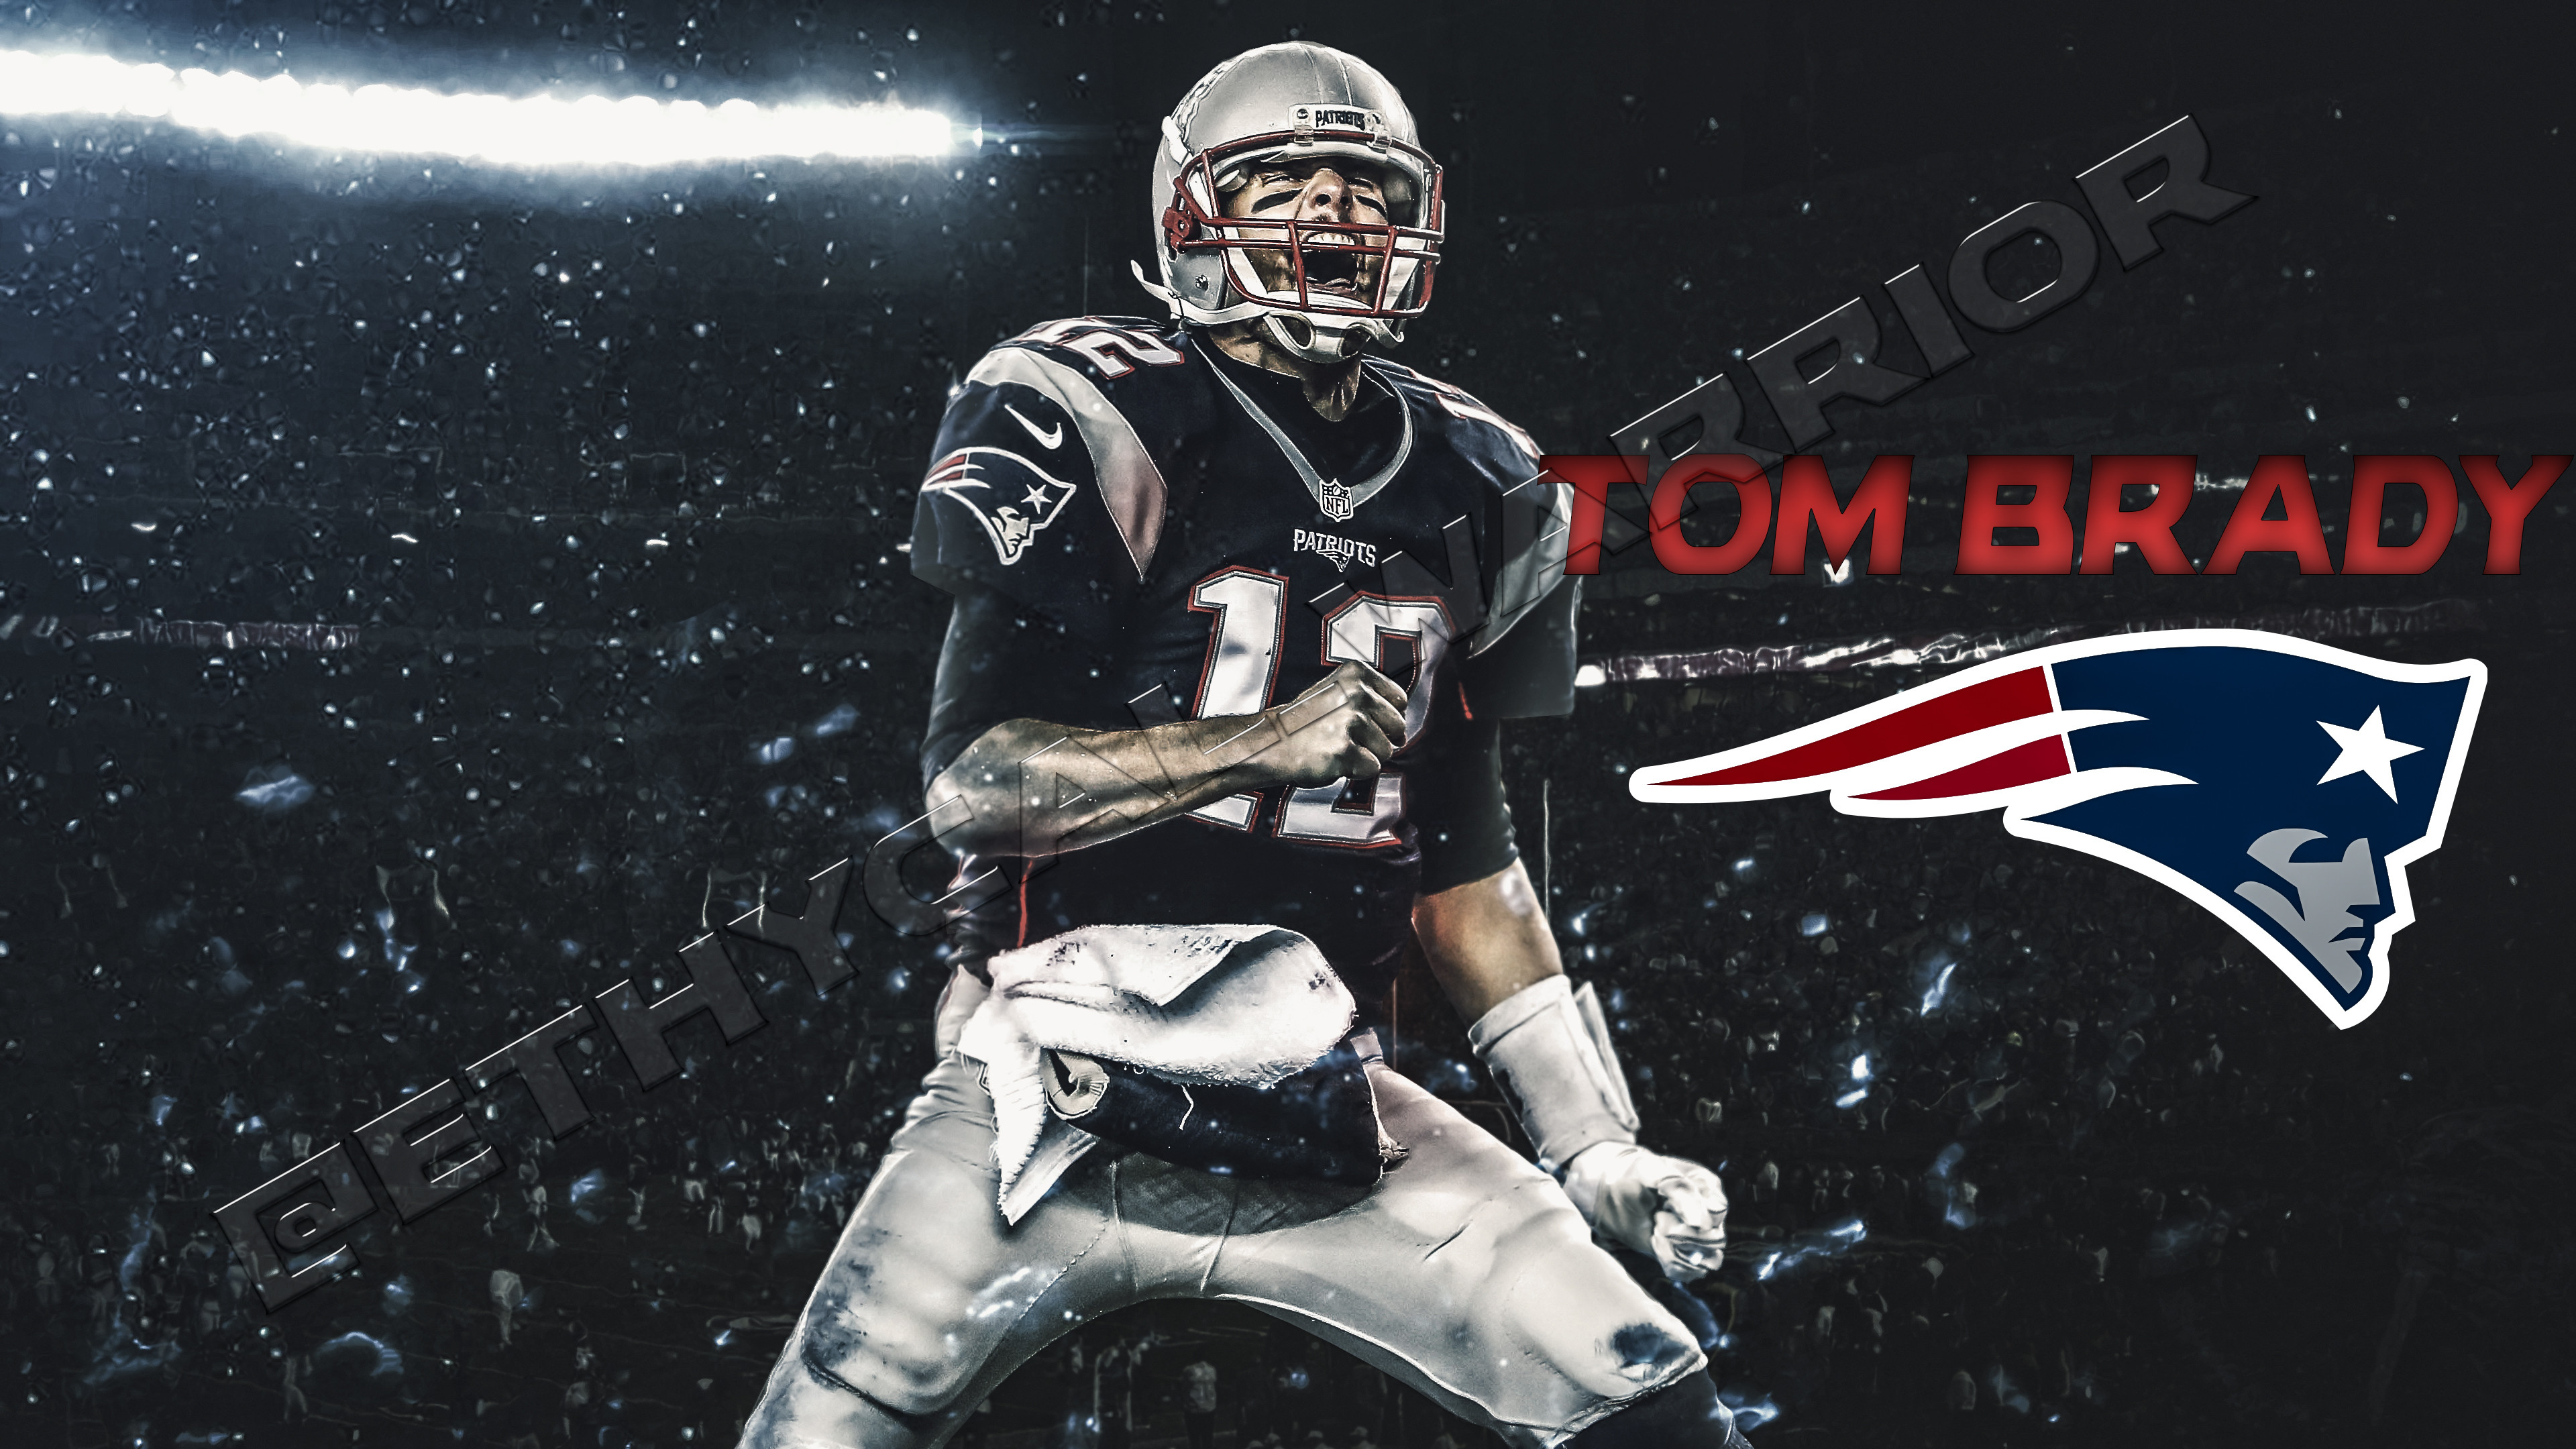 Sport Wallpaper Tom Brady